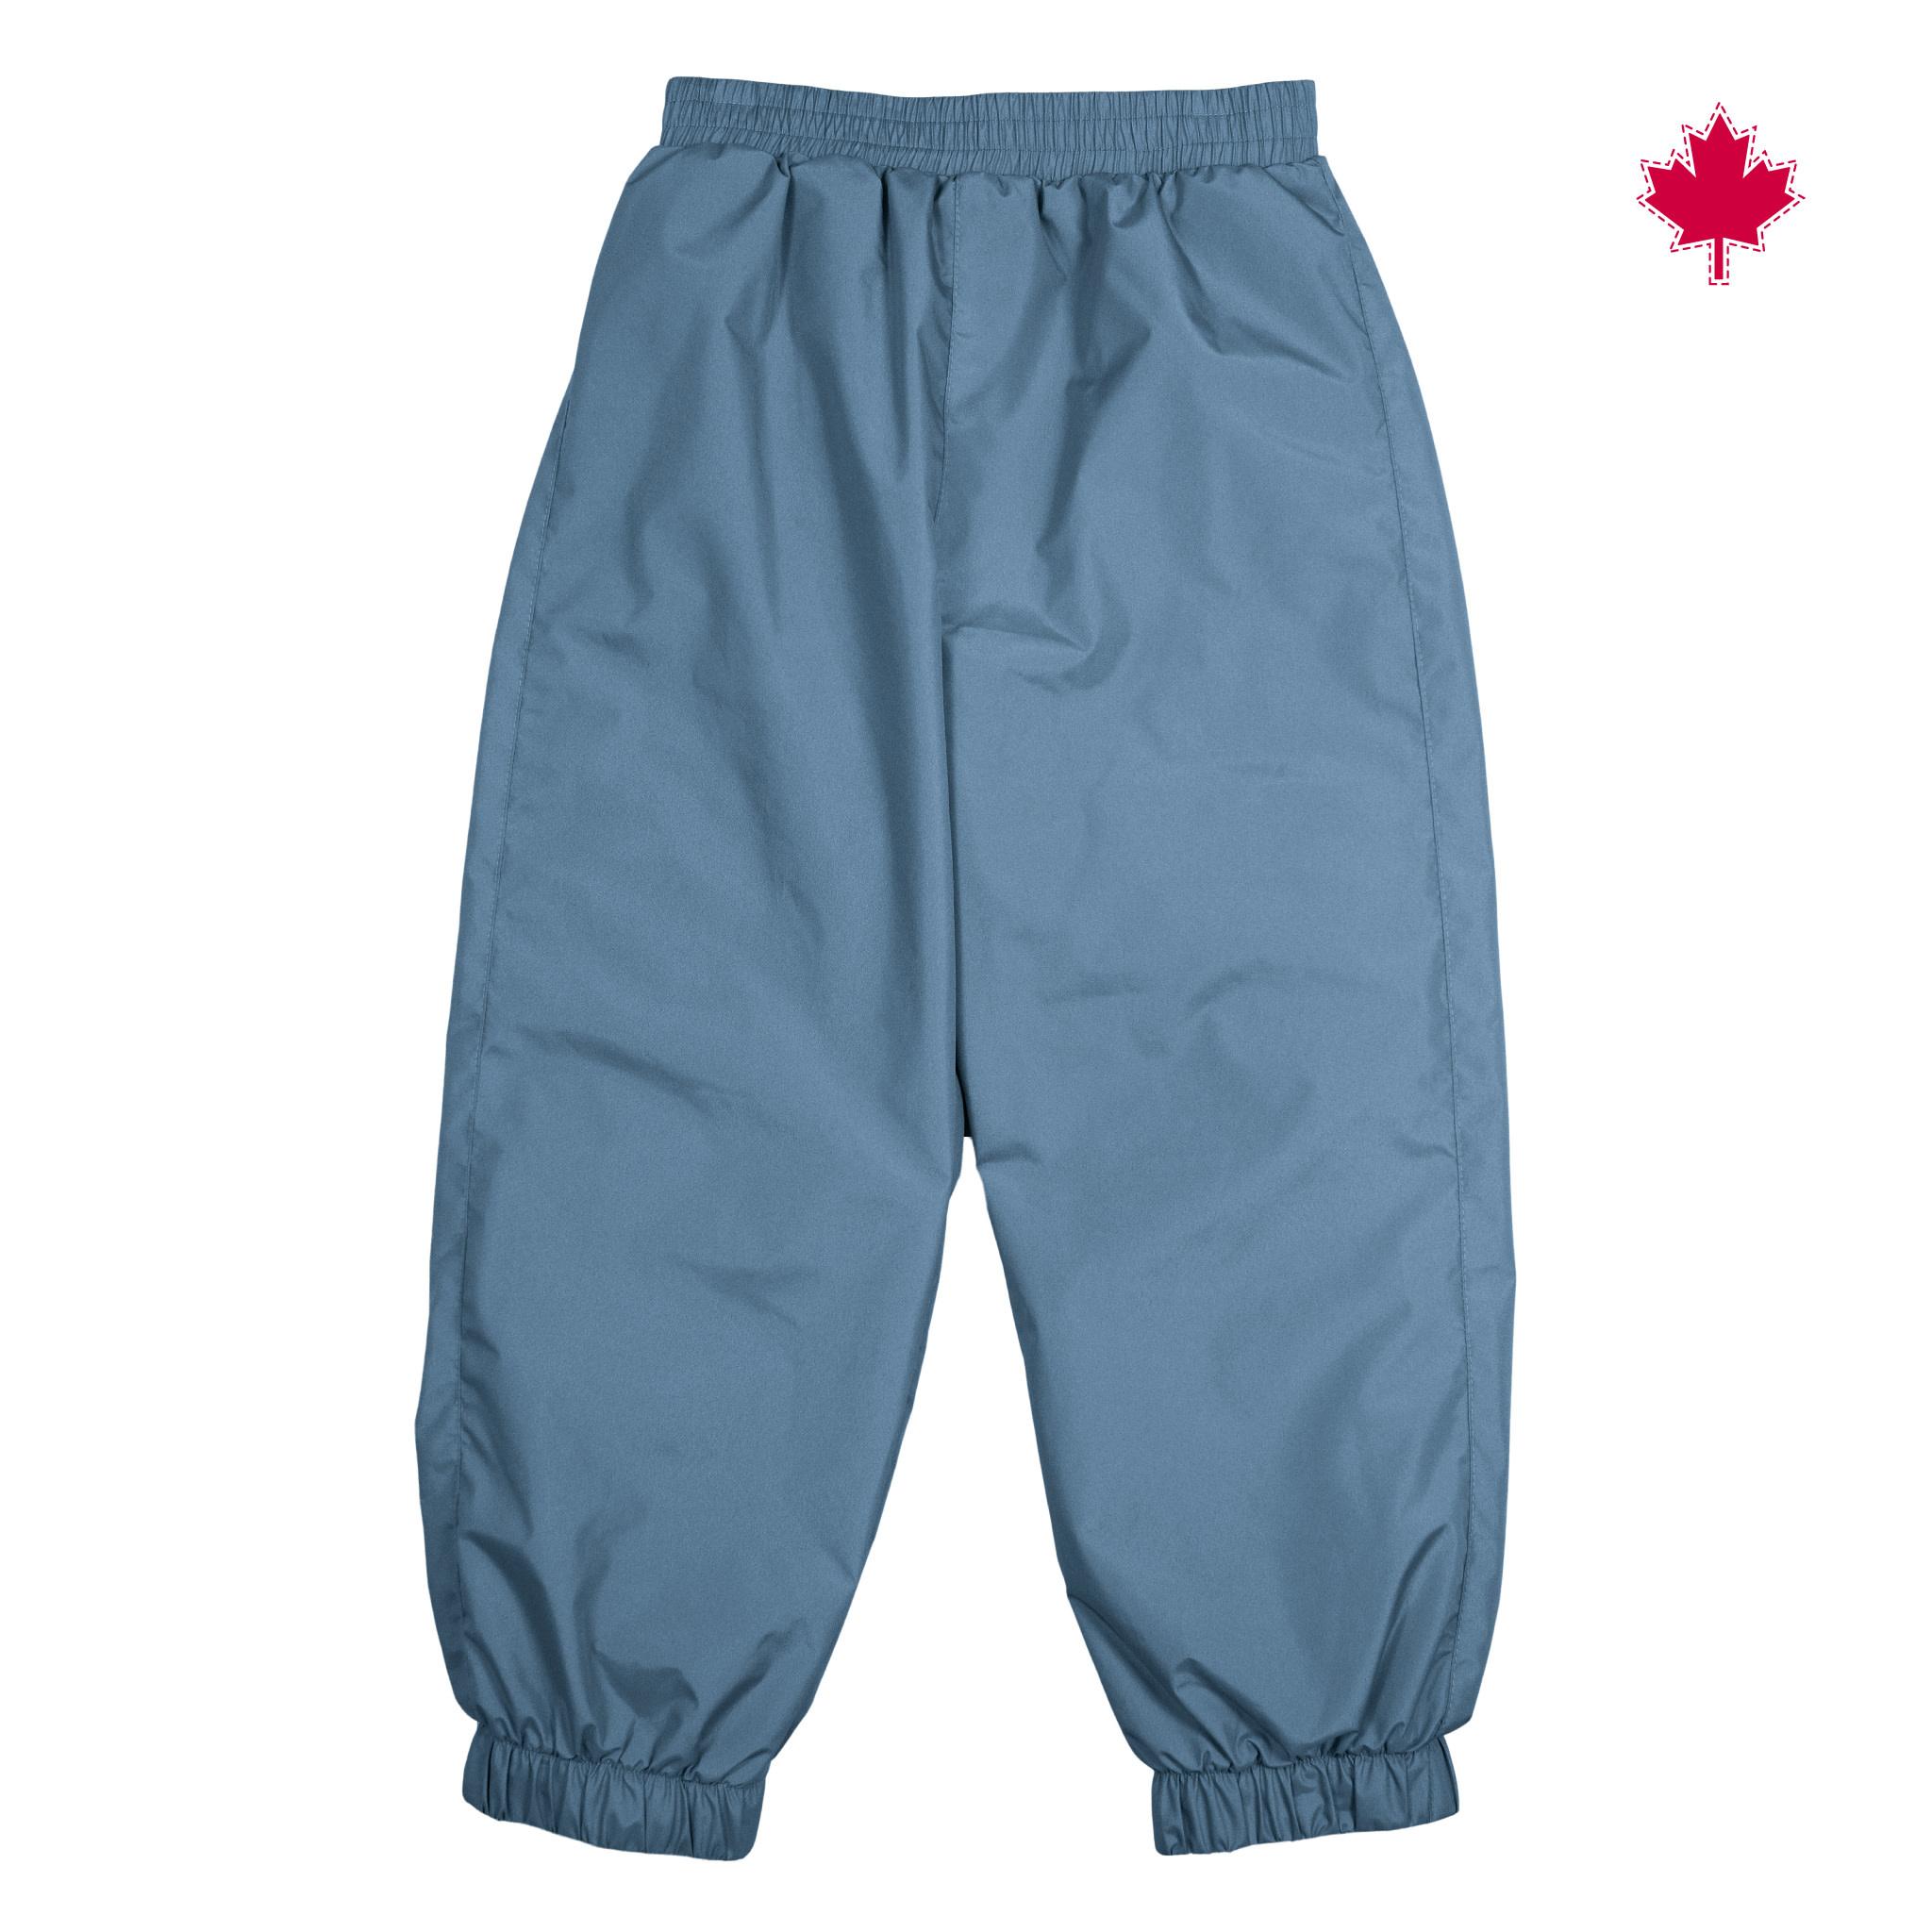 Pantalons mi-saison Taffeta - Medium Bleu-1